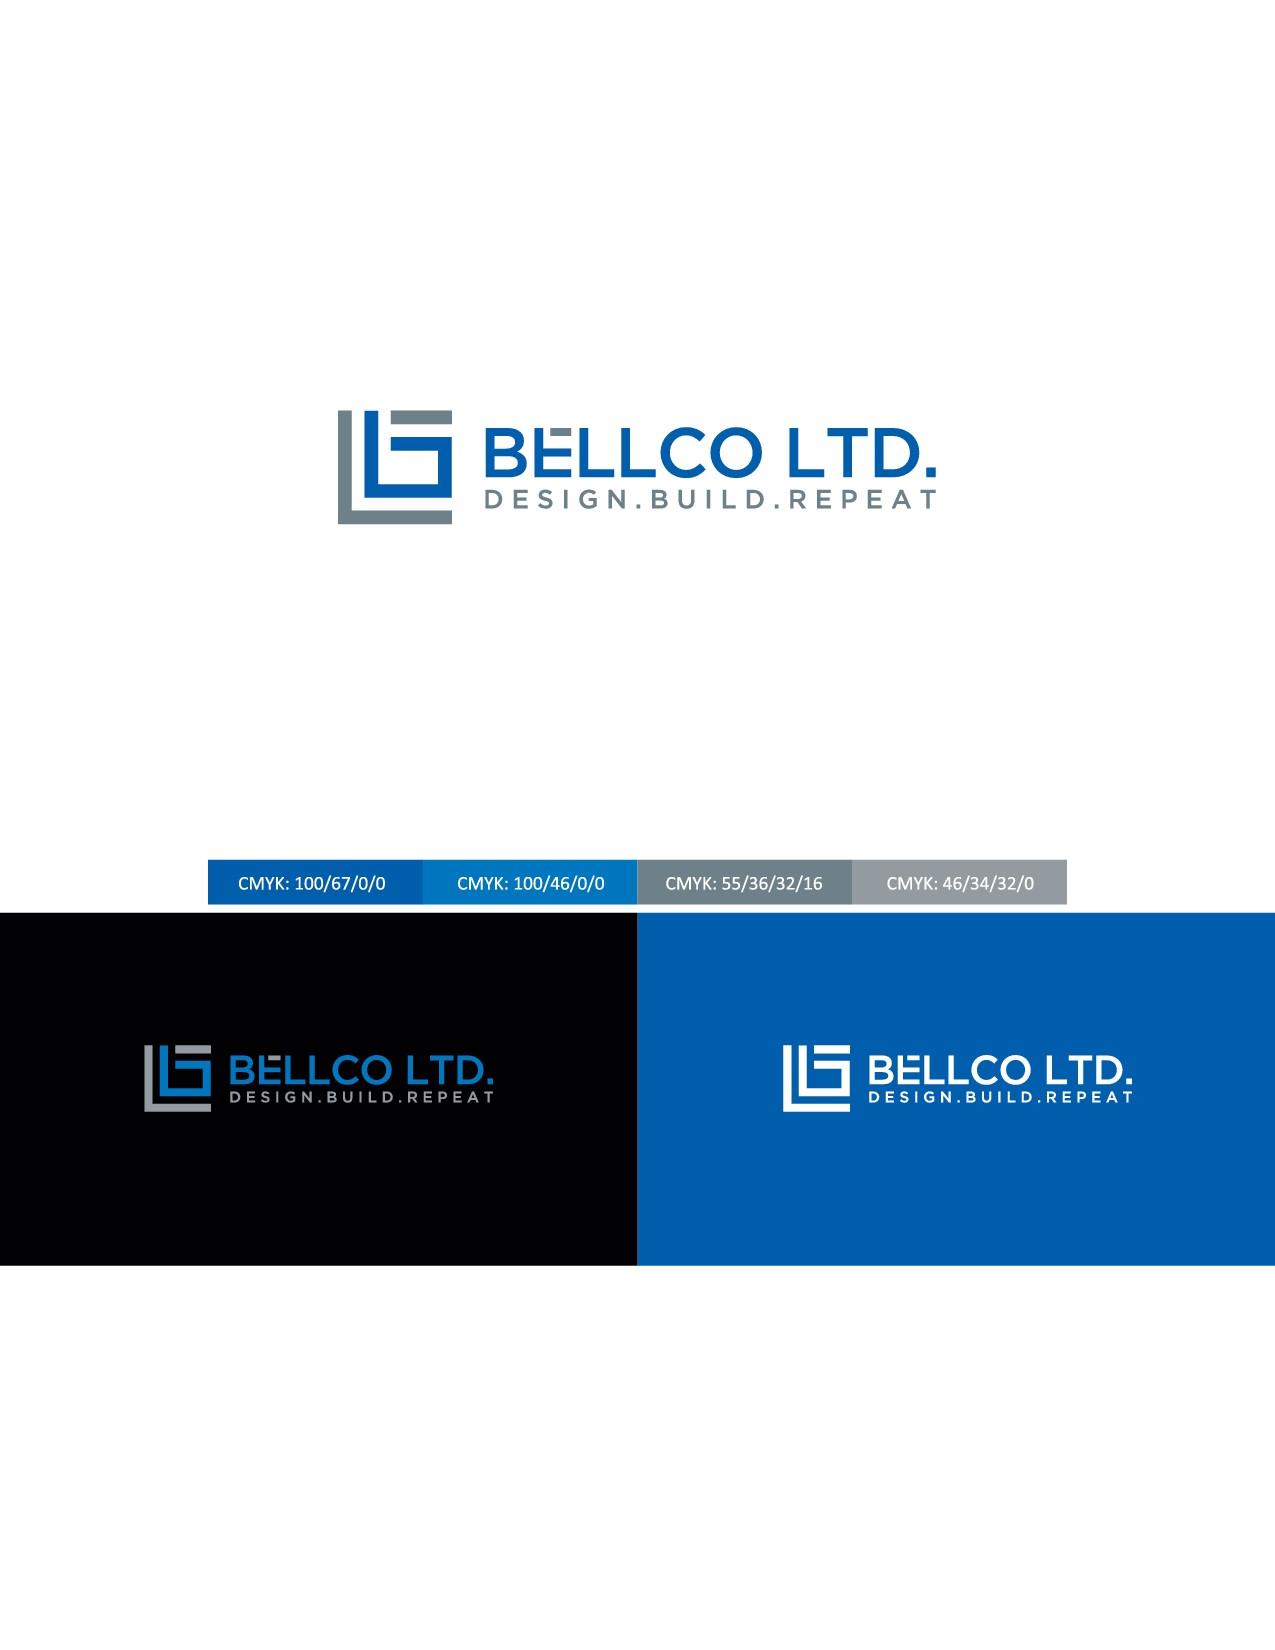 BELLCO LTD.